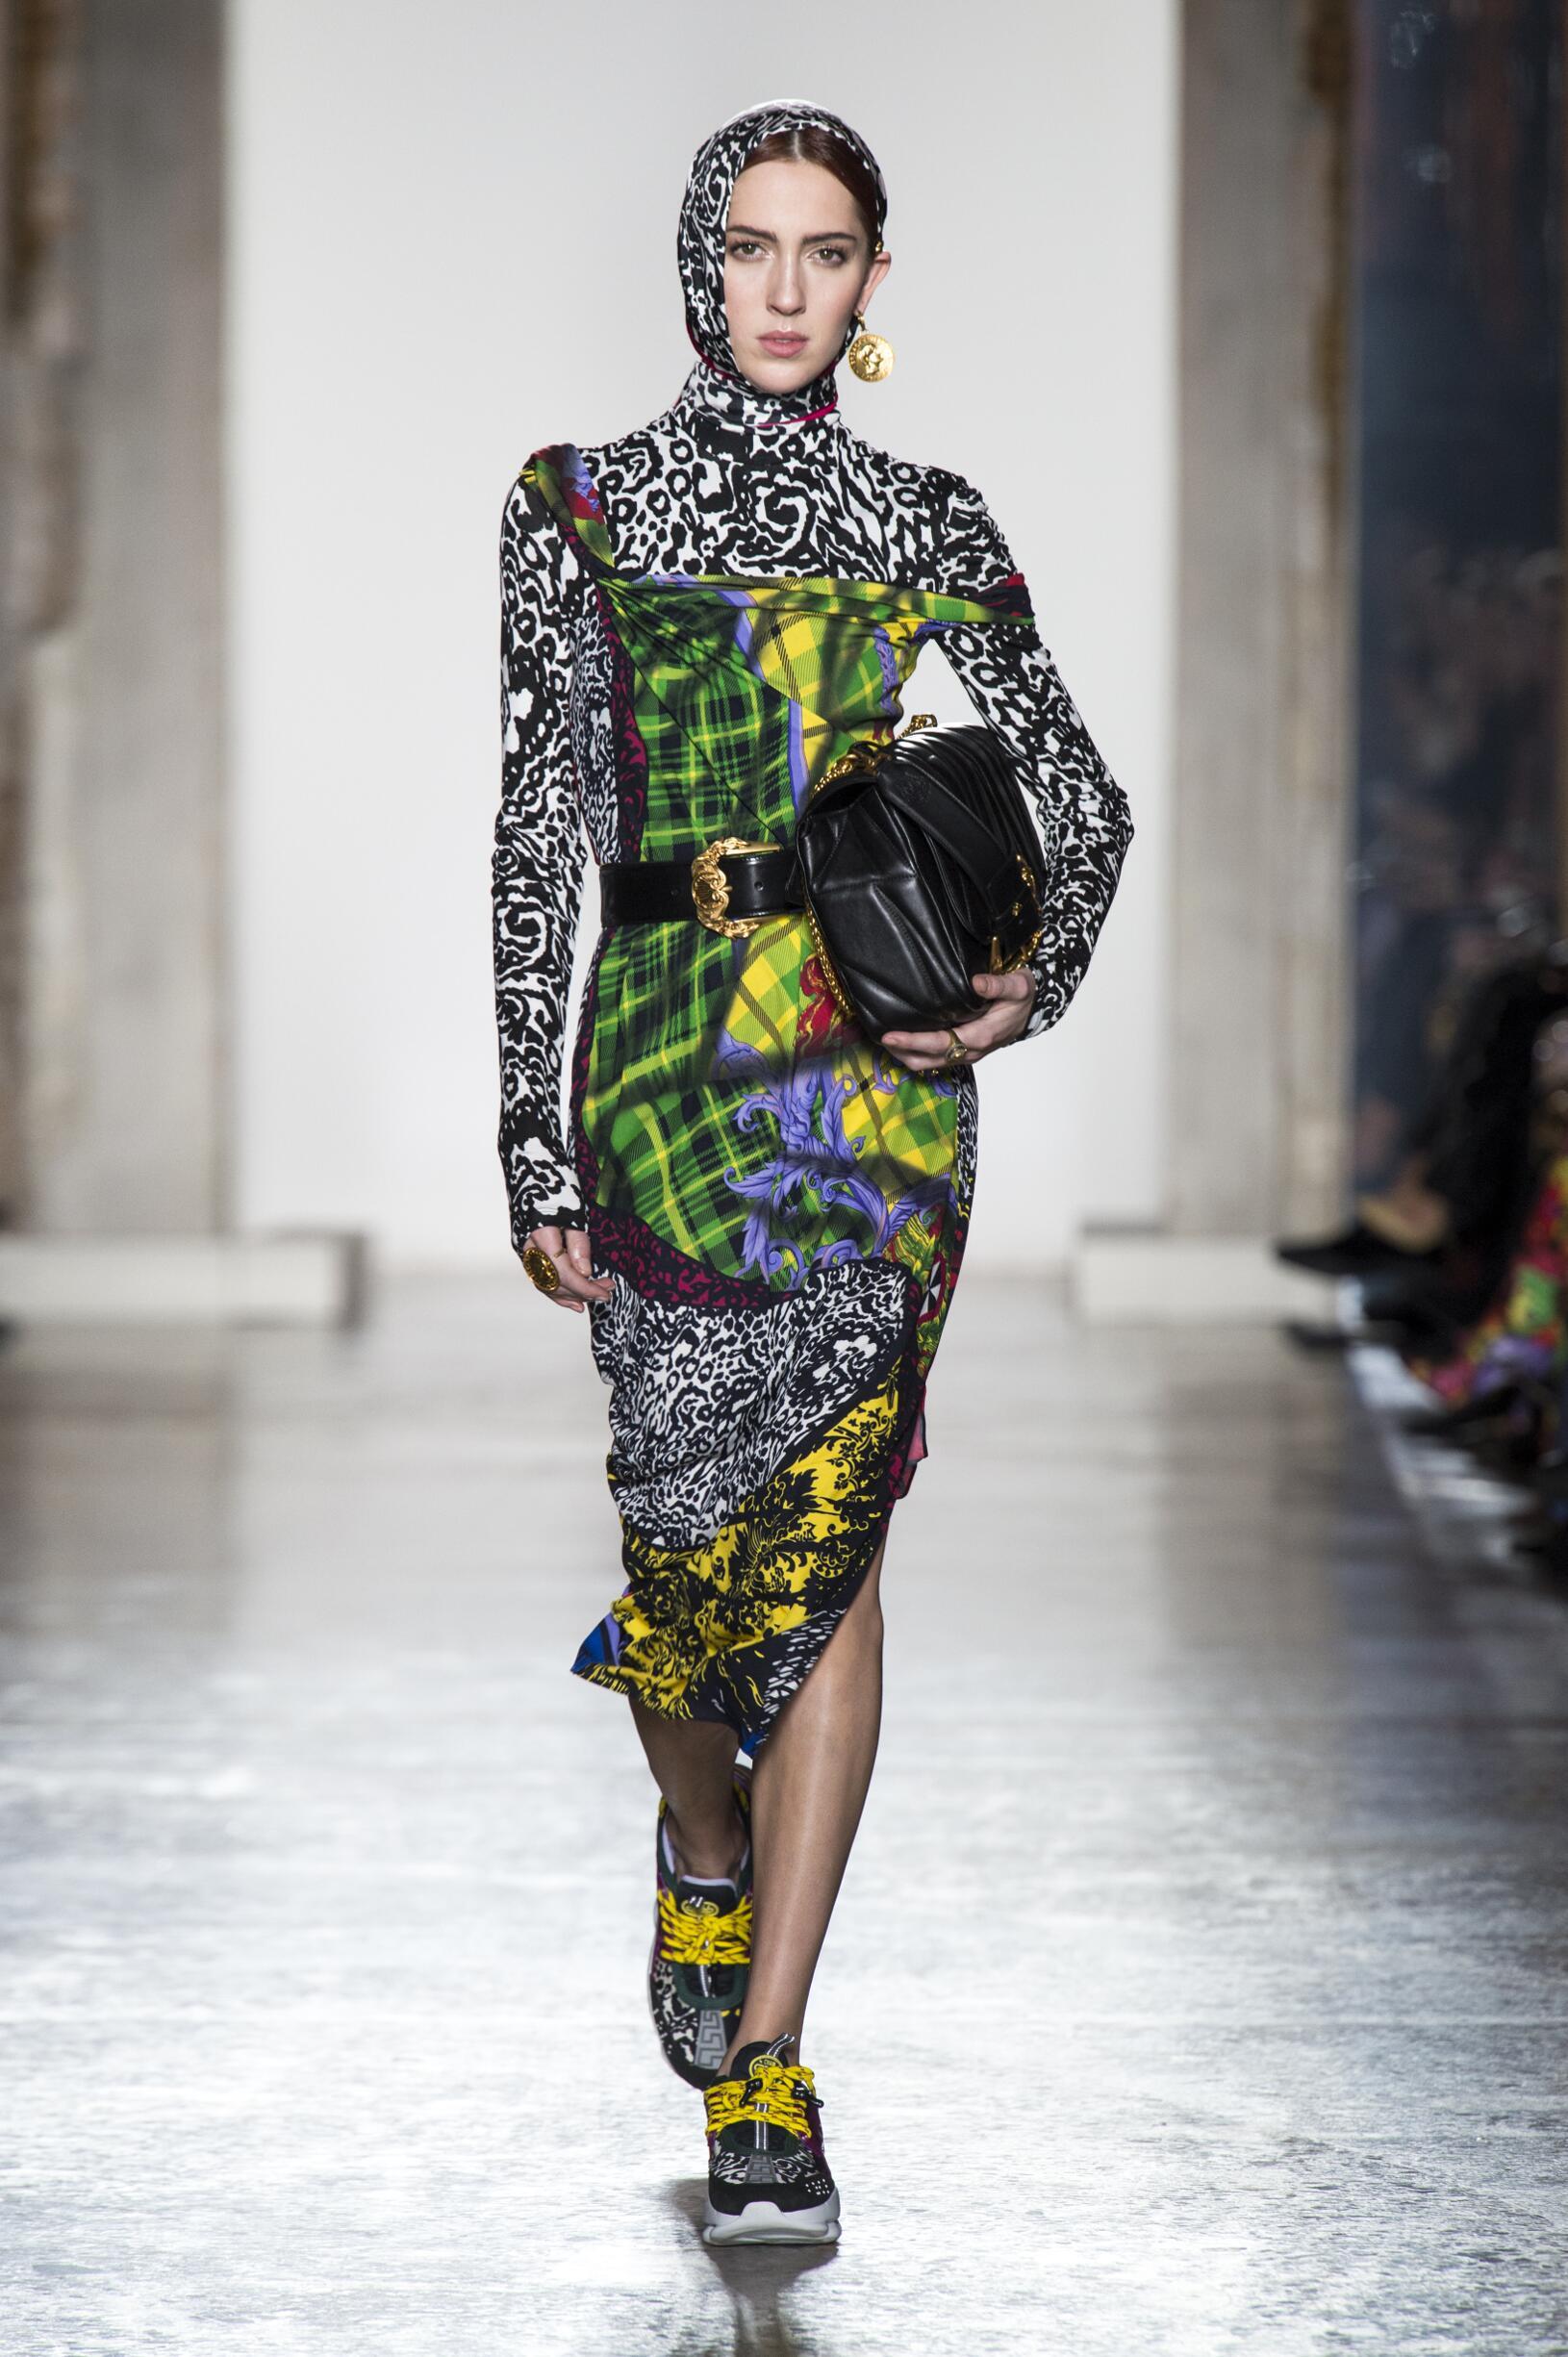 versace fall collection week milan winter dress runway 90s fashionweek skinny donatella